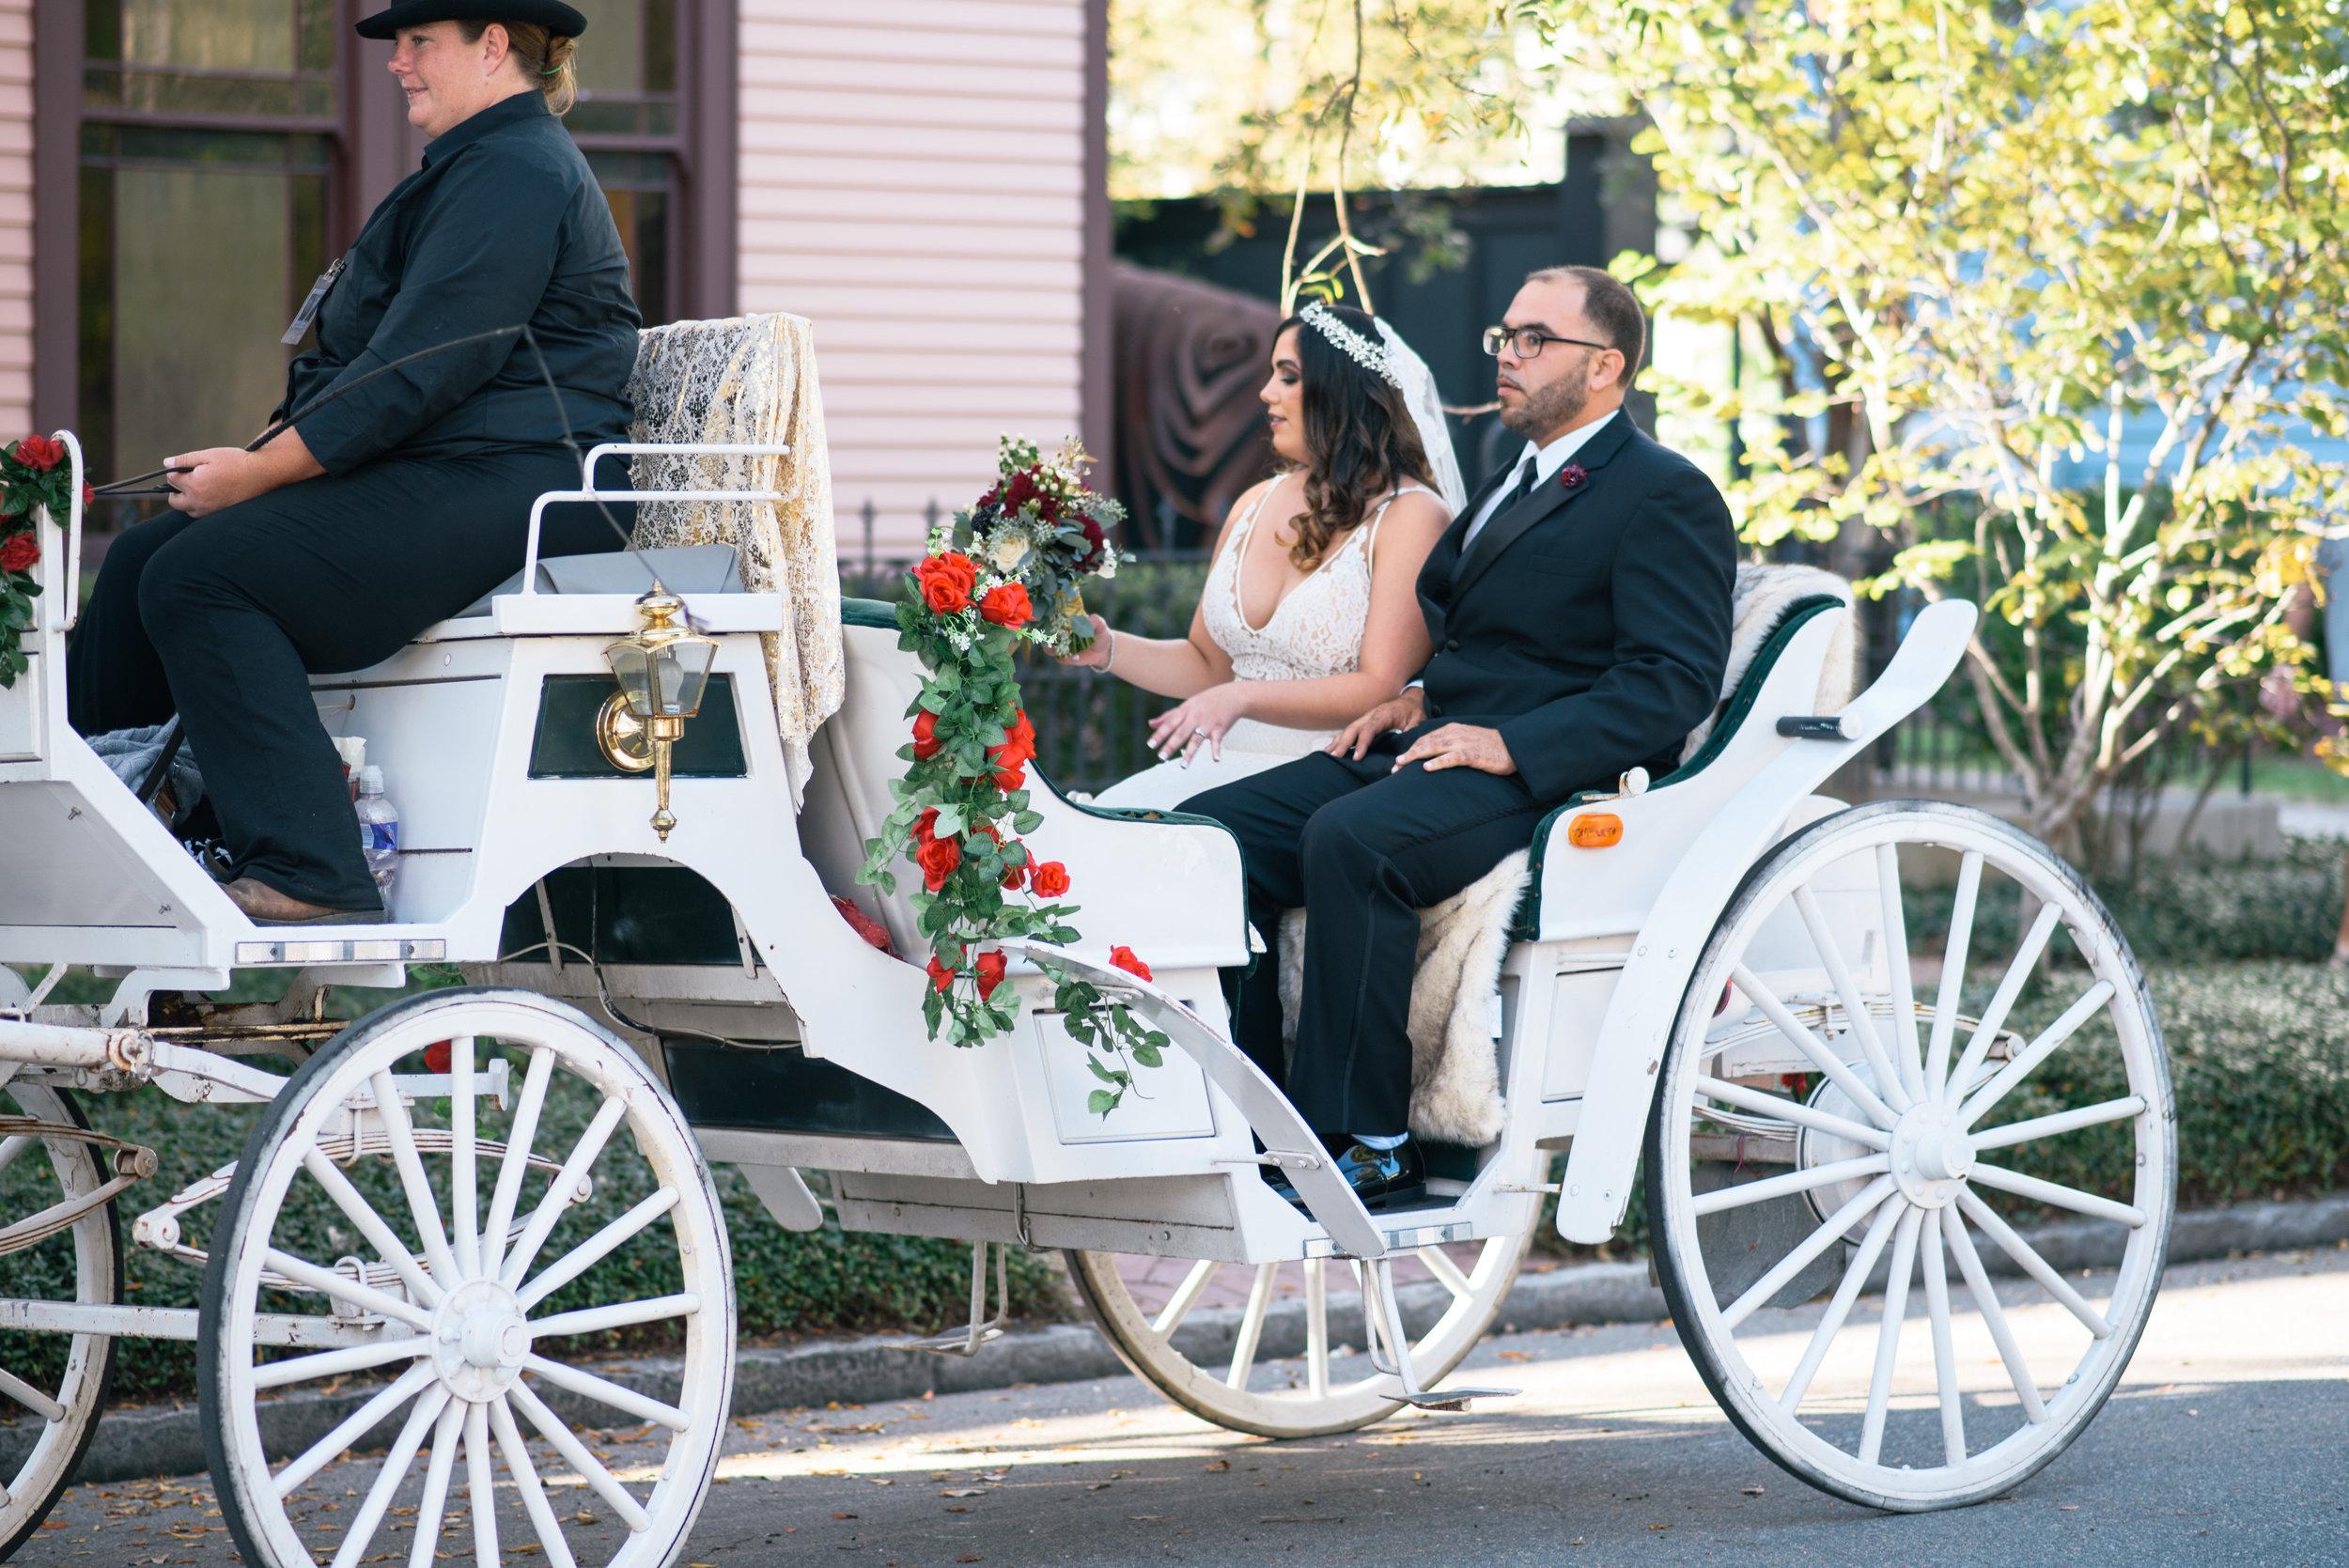 Iggy-and-yesenia-savannah-railroad-museum-wedding-meg-hill-photo- (322 of 1037).jpg